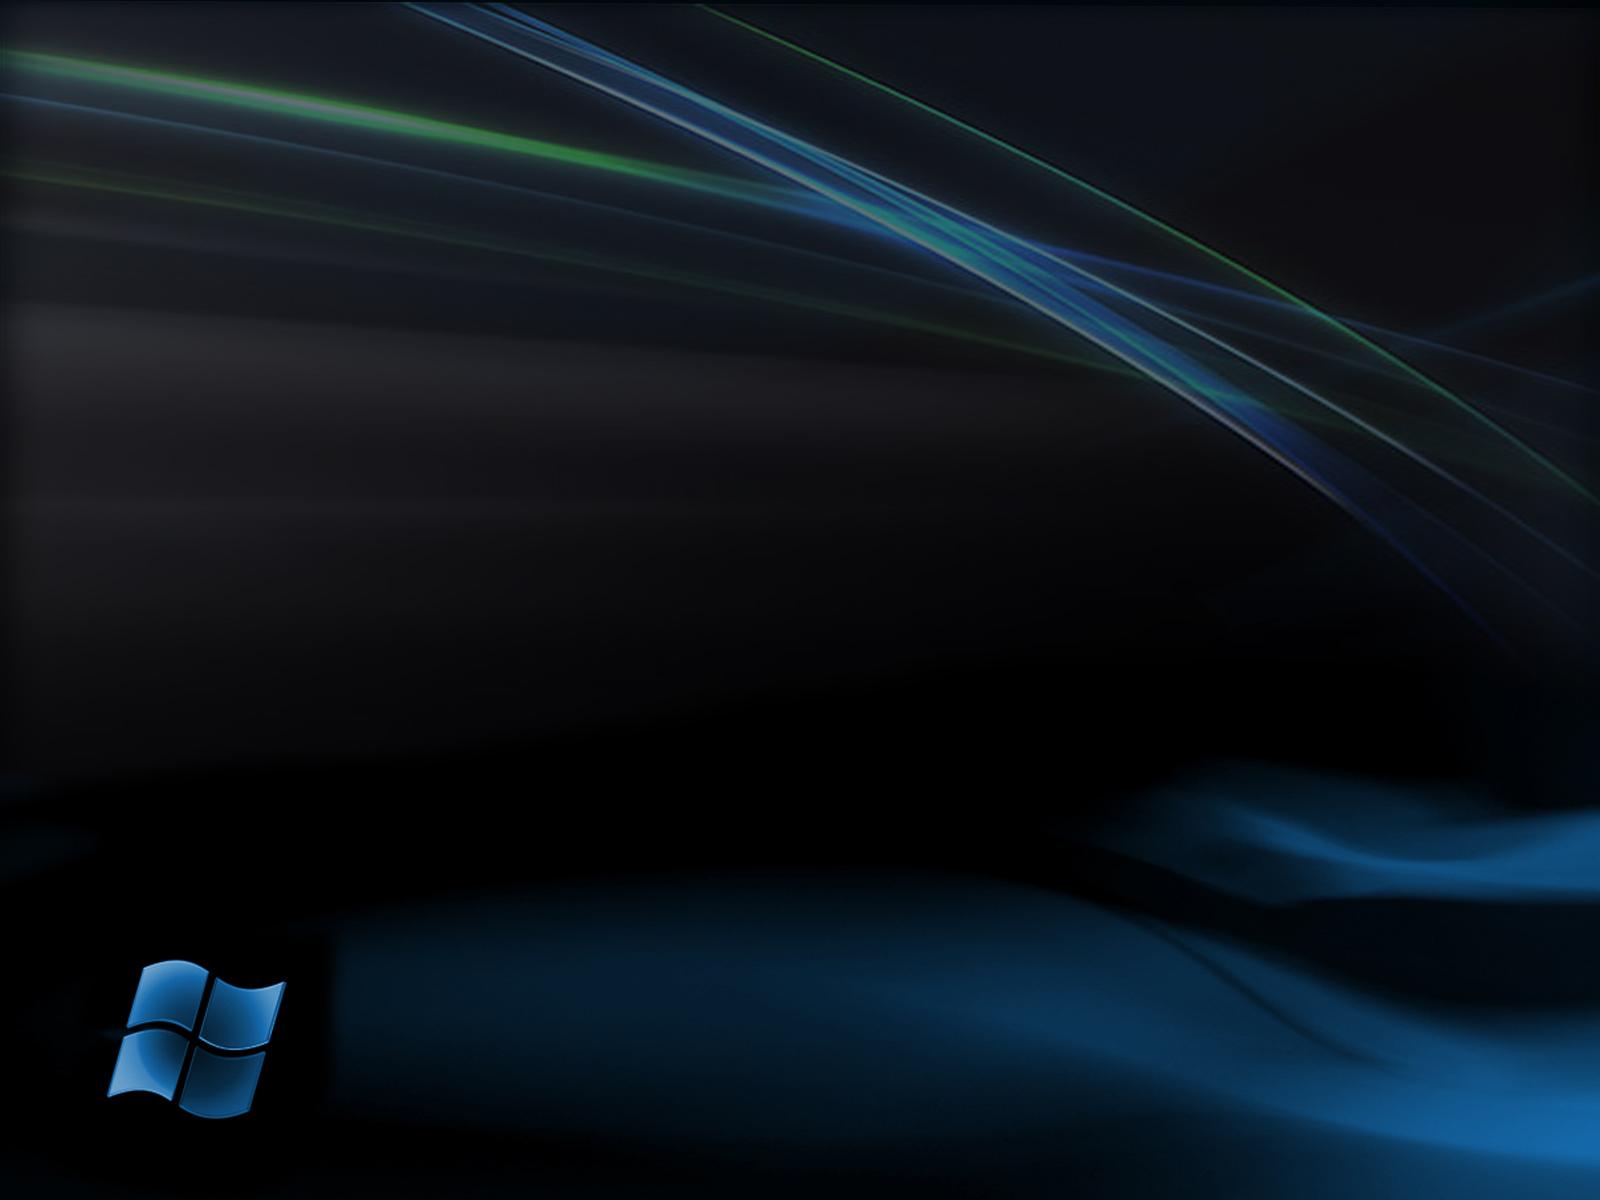 http://4.bp.blogspot.com/_gx7OZdt7Uhs/TT2_NhoCOcI/AAAAAAAAF5A/iLMZvZgmJe4/s1600/windows%2B7%2Bwallpaper%2B4.jpg